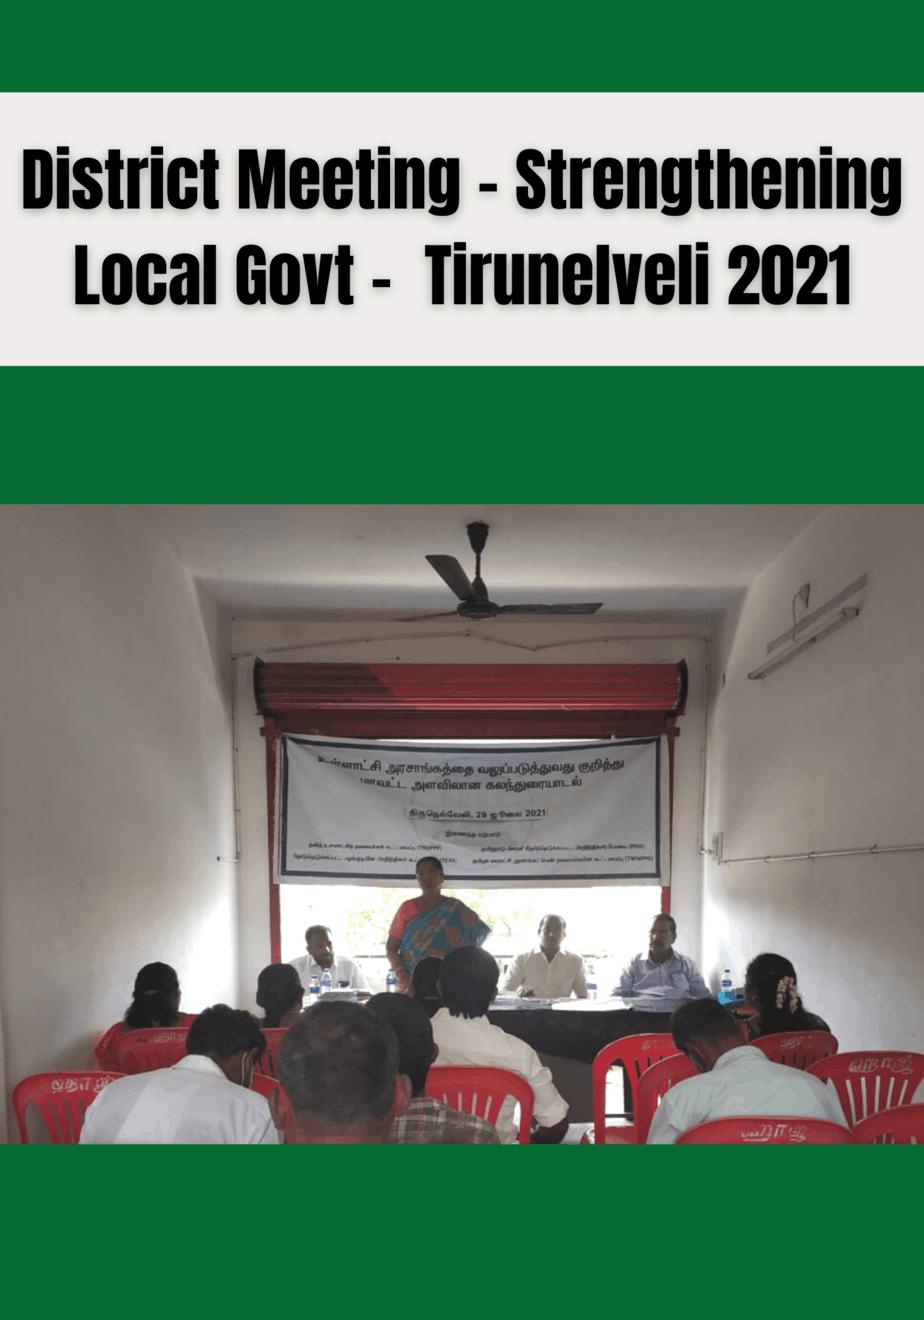 Strengthening local government 2021 – Tirunelveli